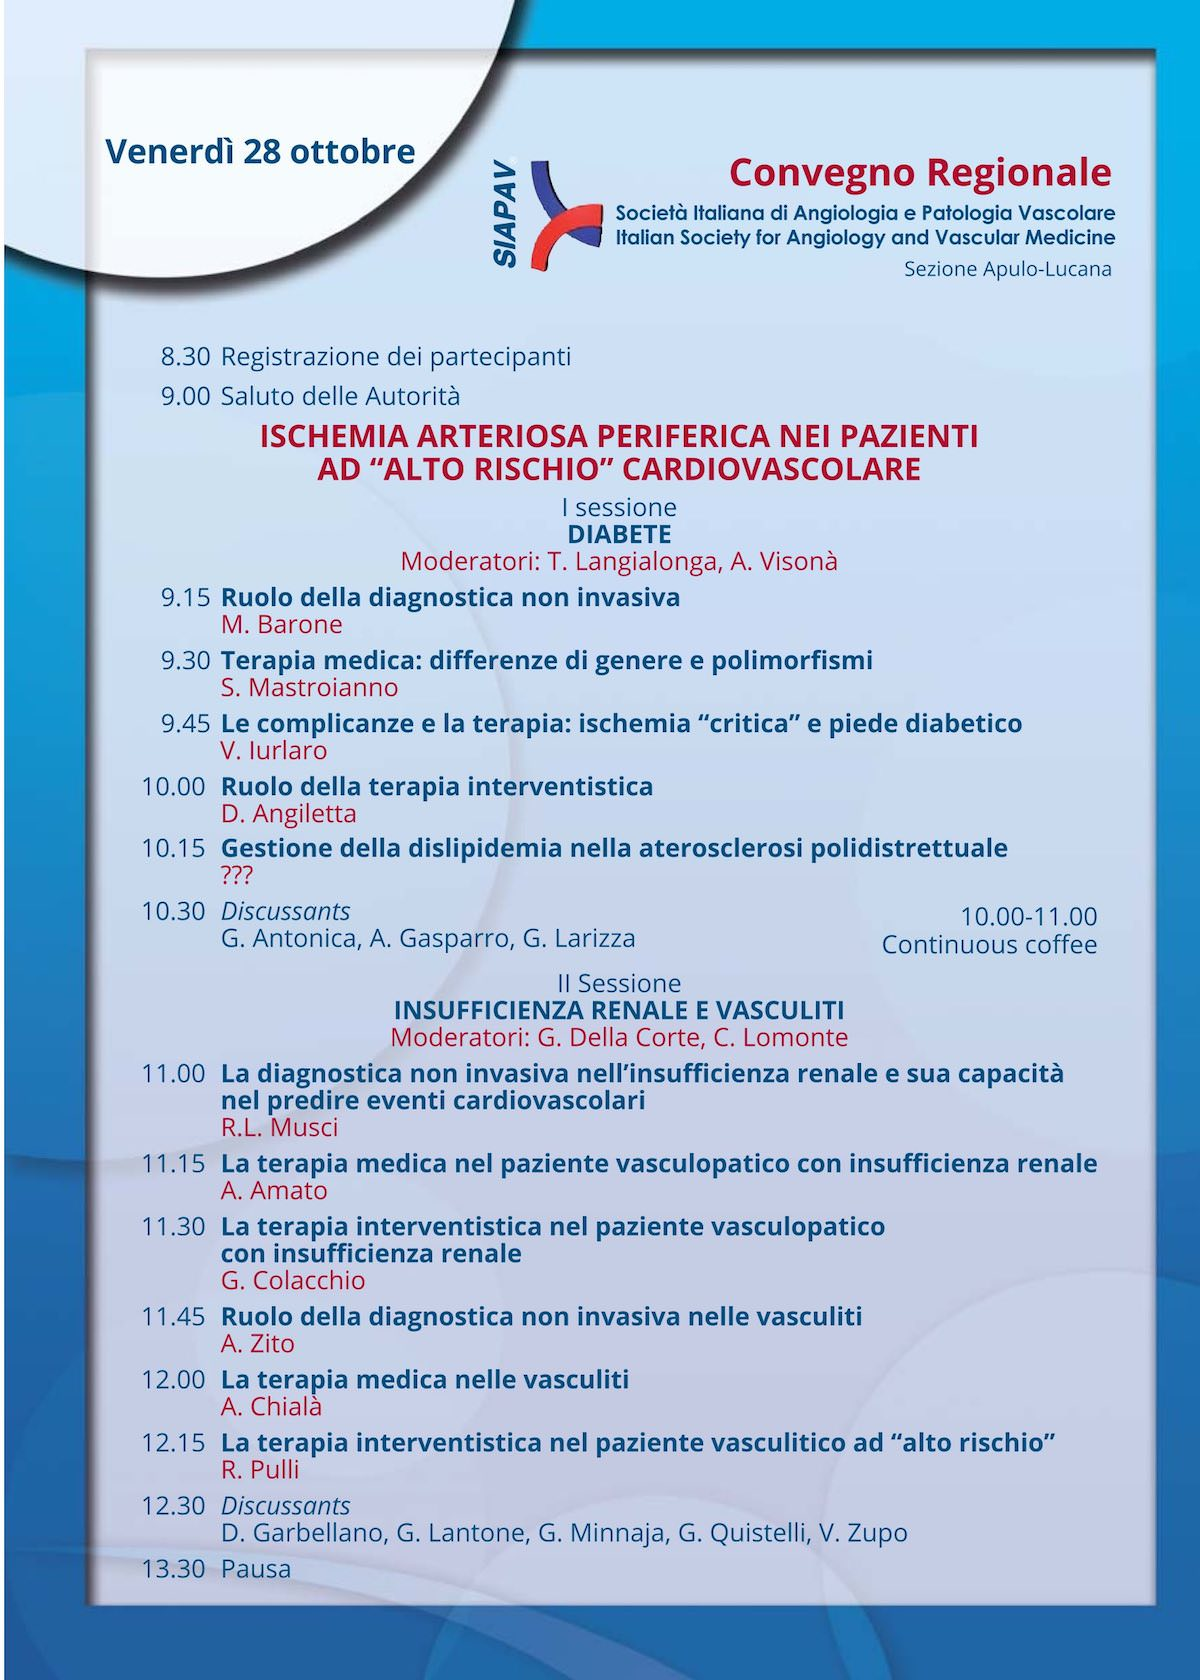 medical-tools-al-convegno-regionale-siapav-diagnosis-management-and-rehabilitation-of-vascular-disease-valenzano-2016-3